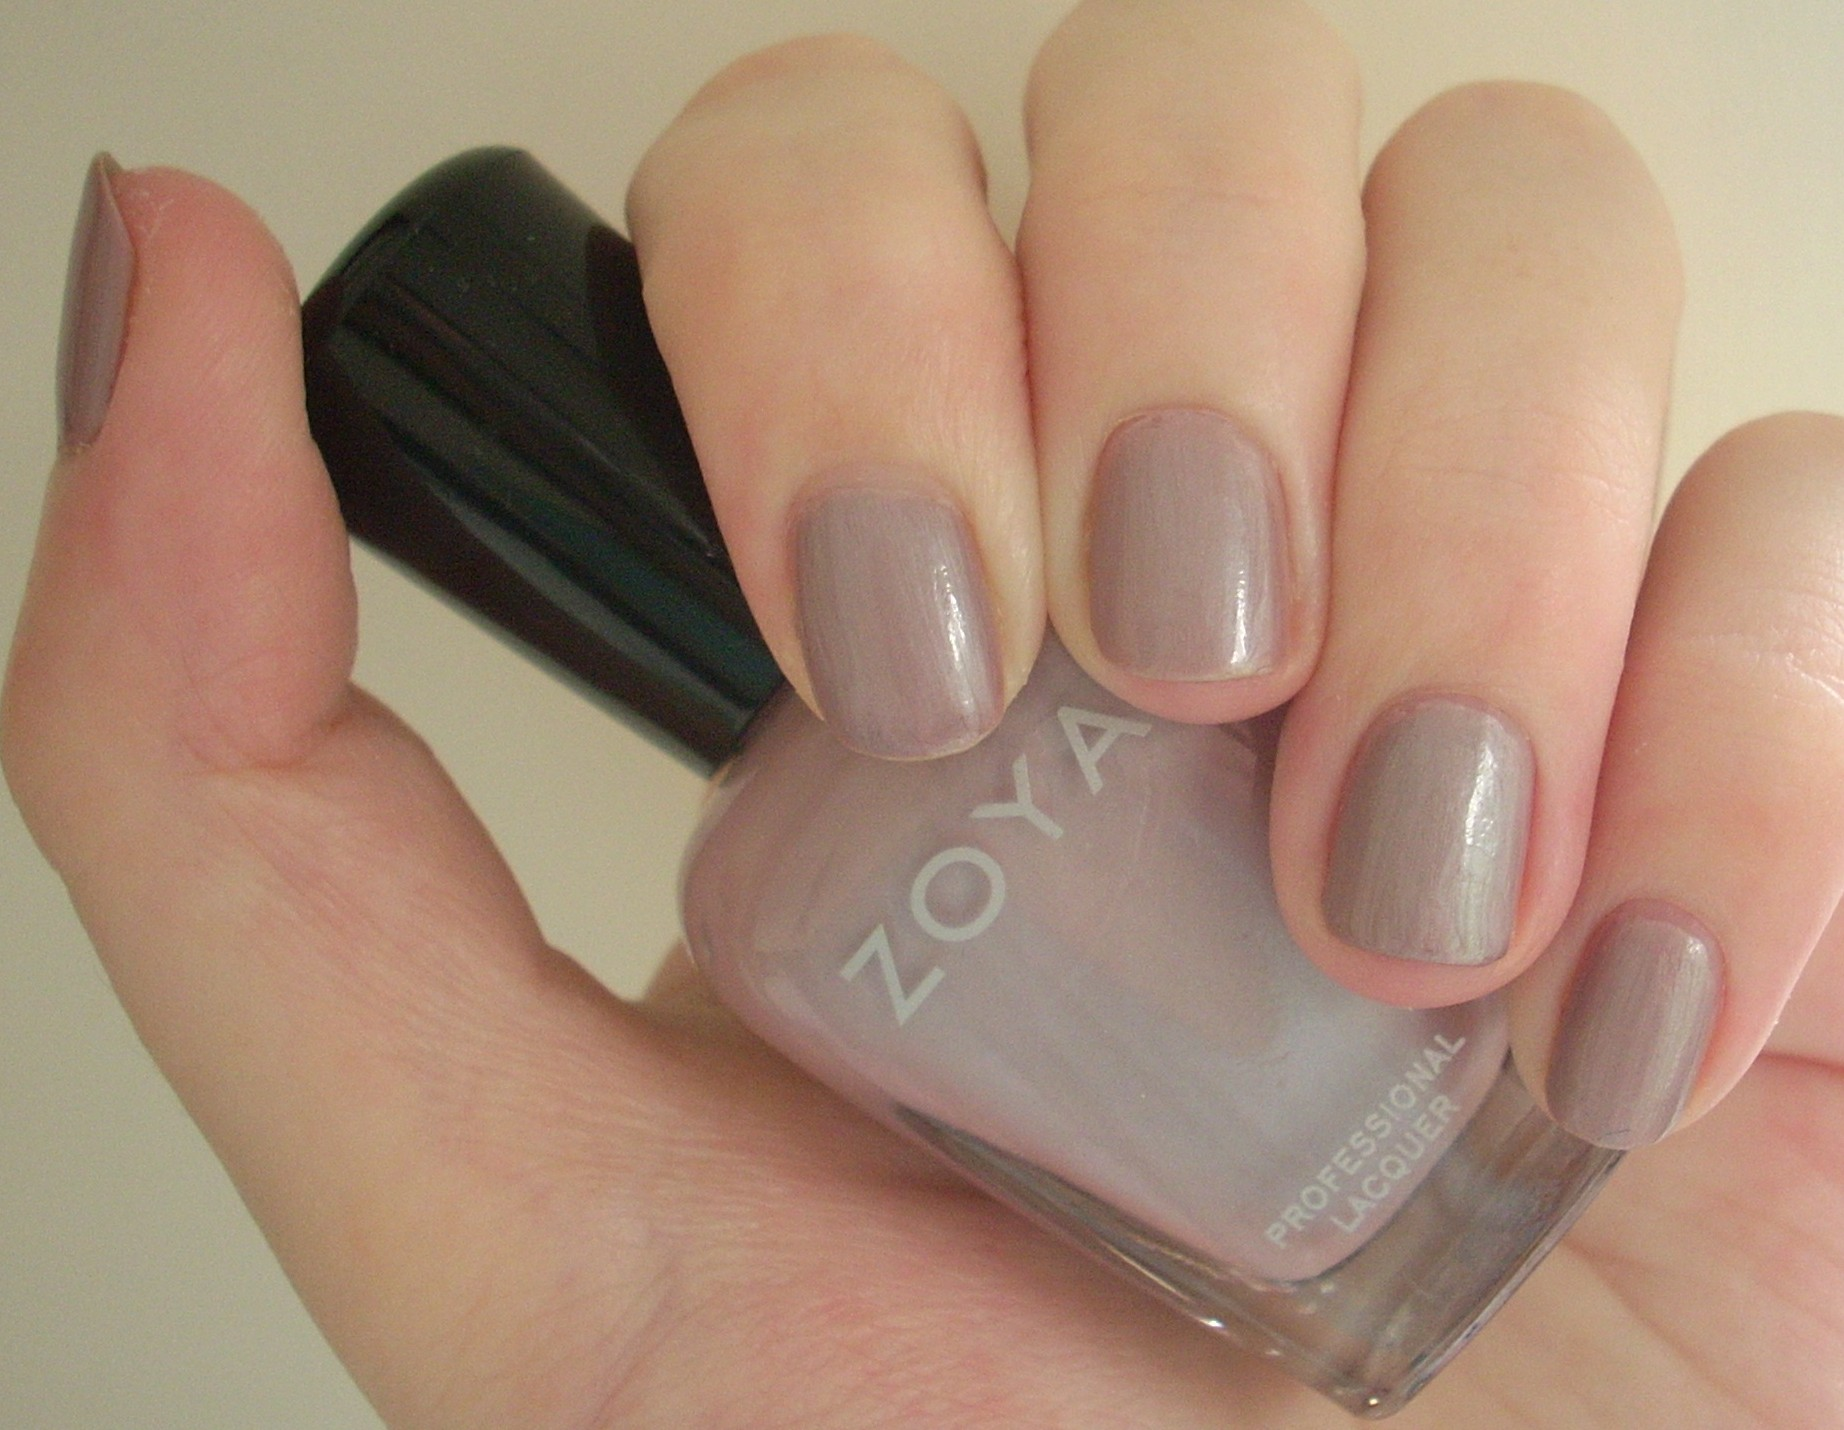 nail - Best Nail Polish Colors For Fair Skin